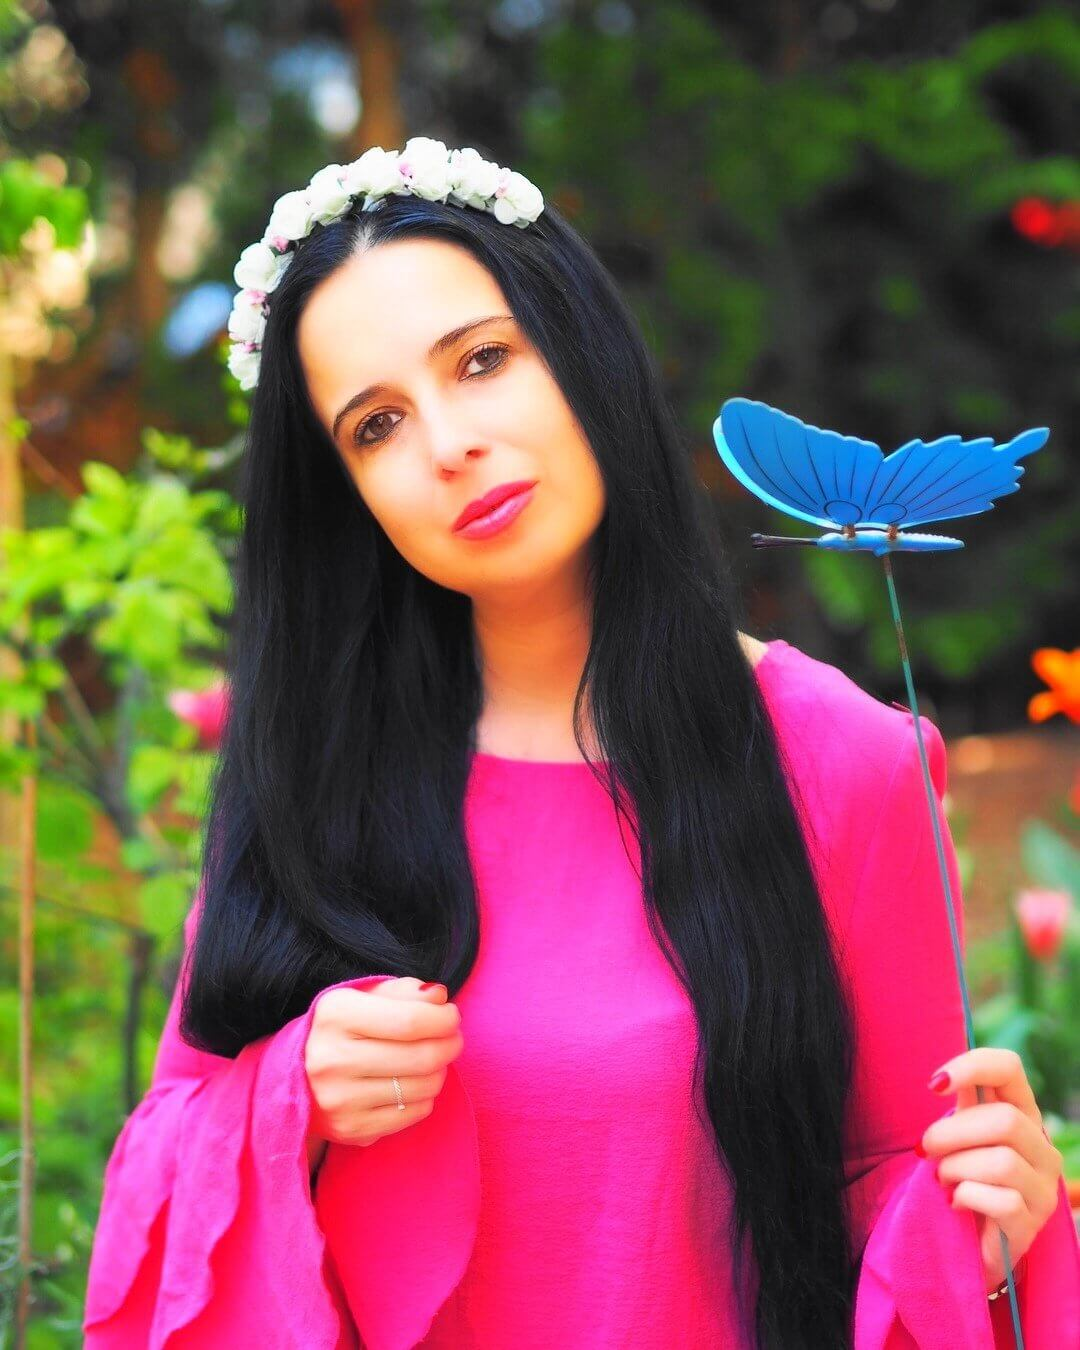 Kosmetik-Produkte von pixi by Petra